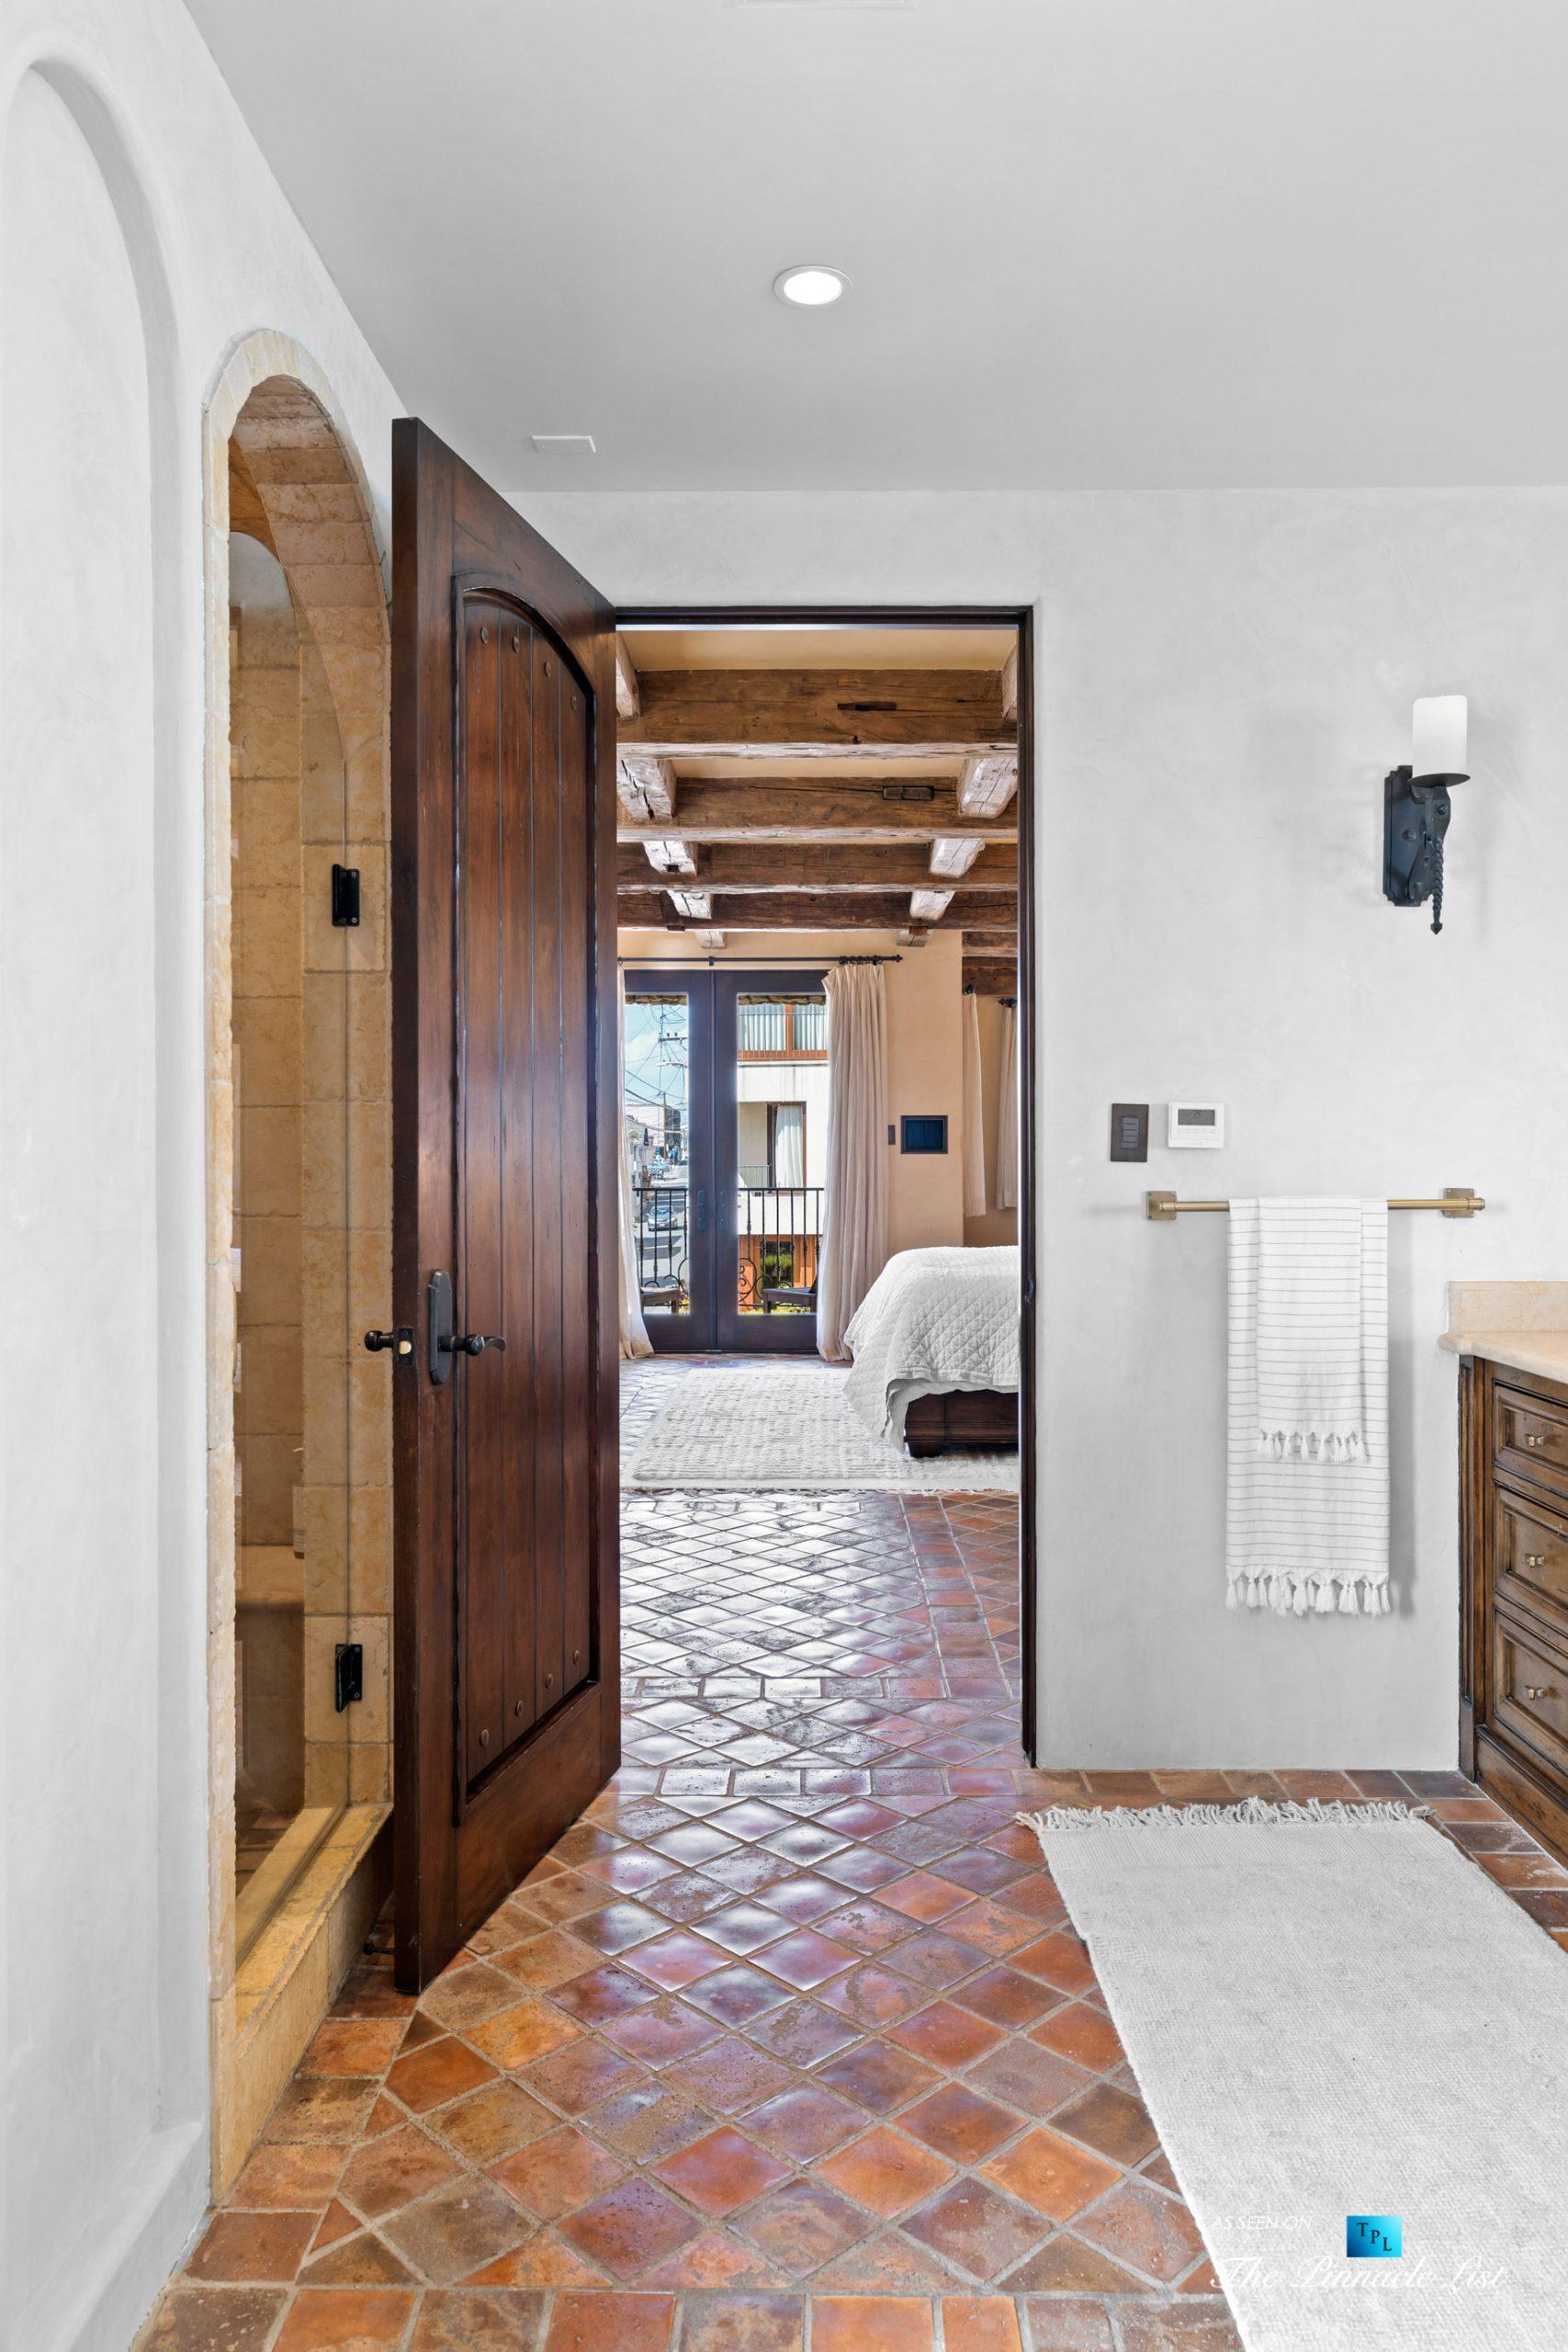 216 7th St, Manhattan Beach, CA, USA – Luxury Real Estate – Coastal Villa Home – Master Bathroom and Bedroom